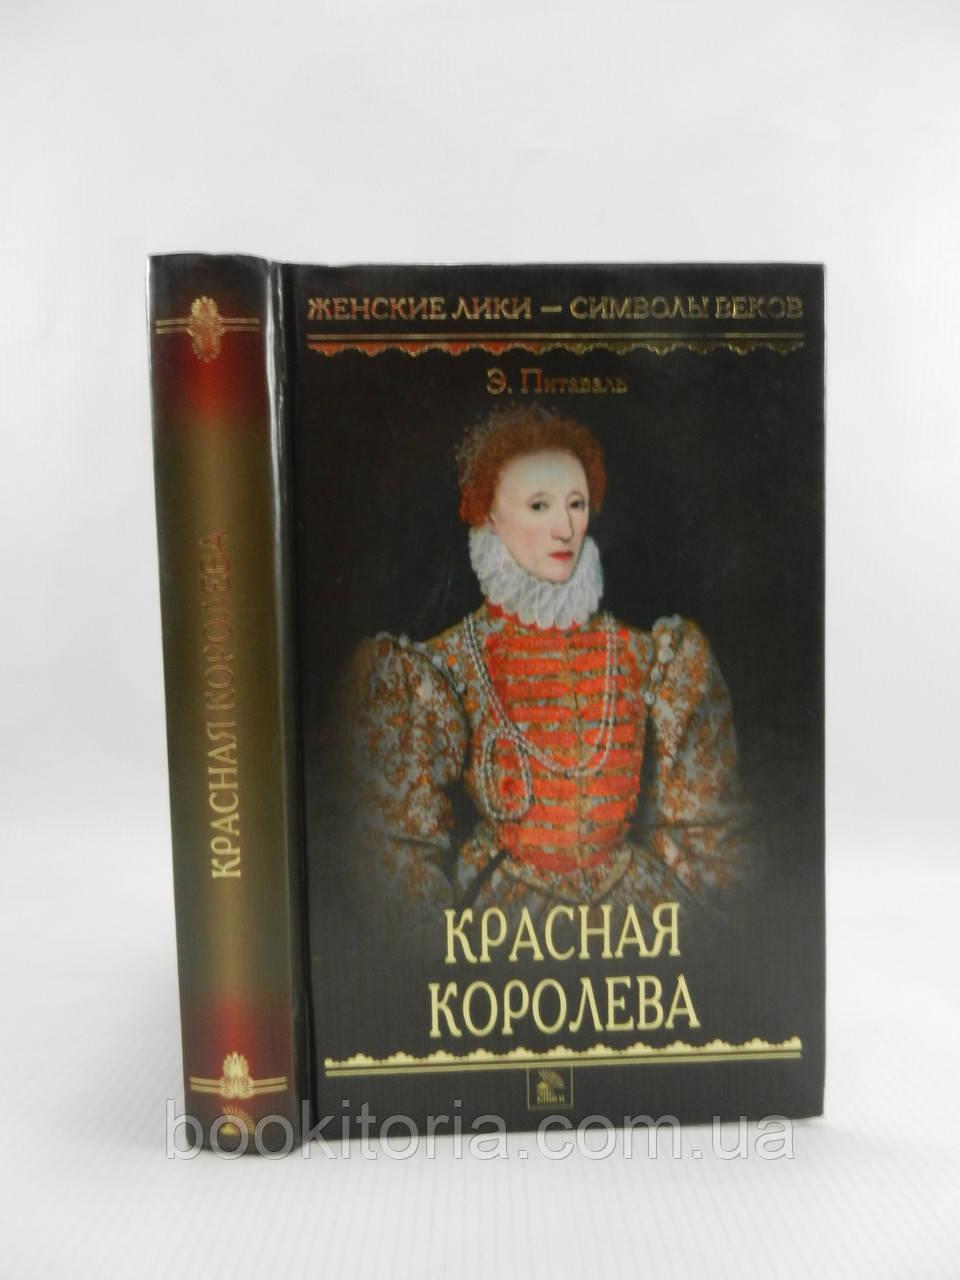 Питаваль Э. Красная королева (б/у).